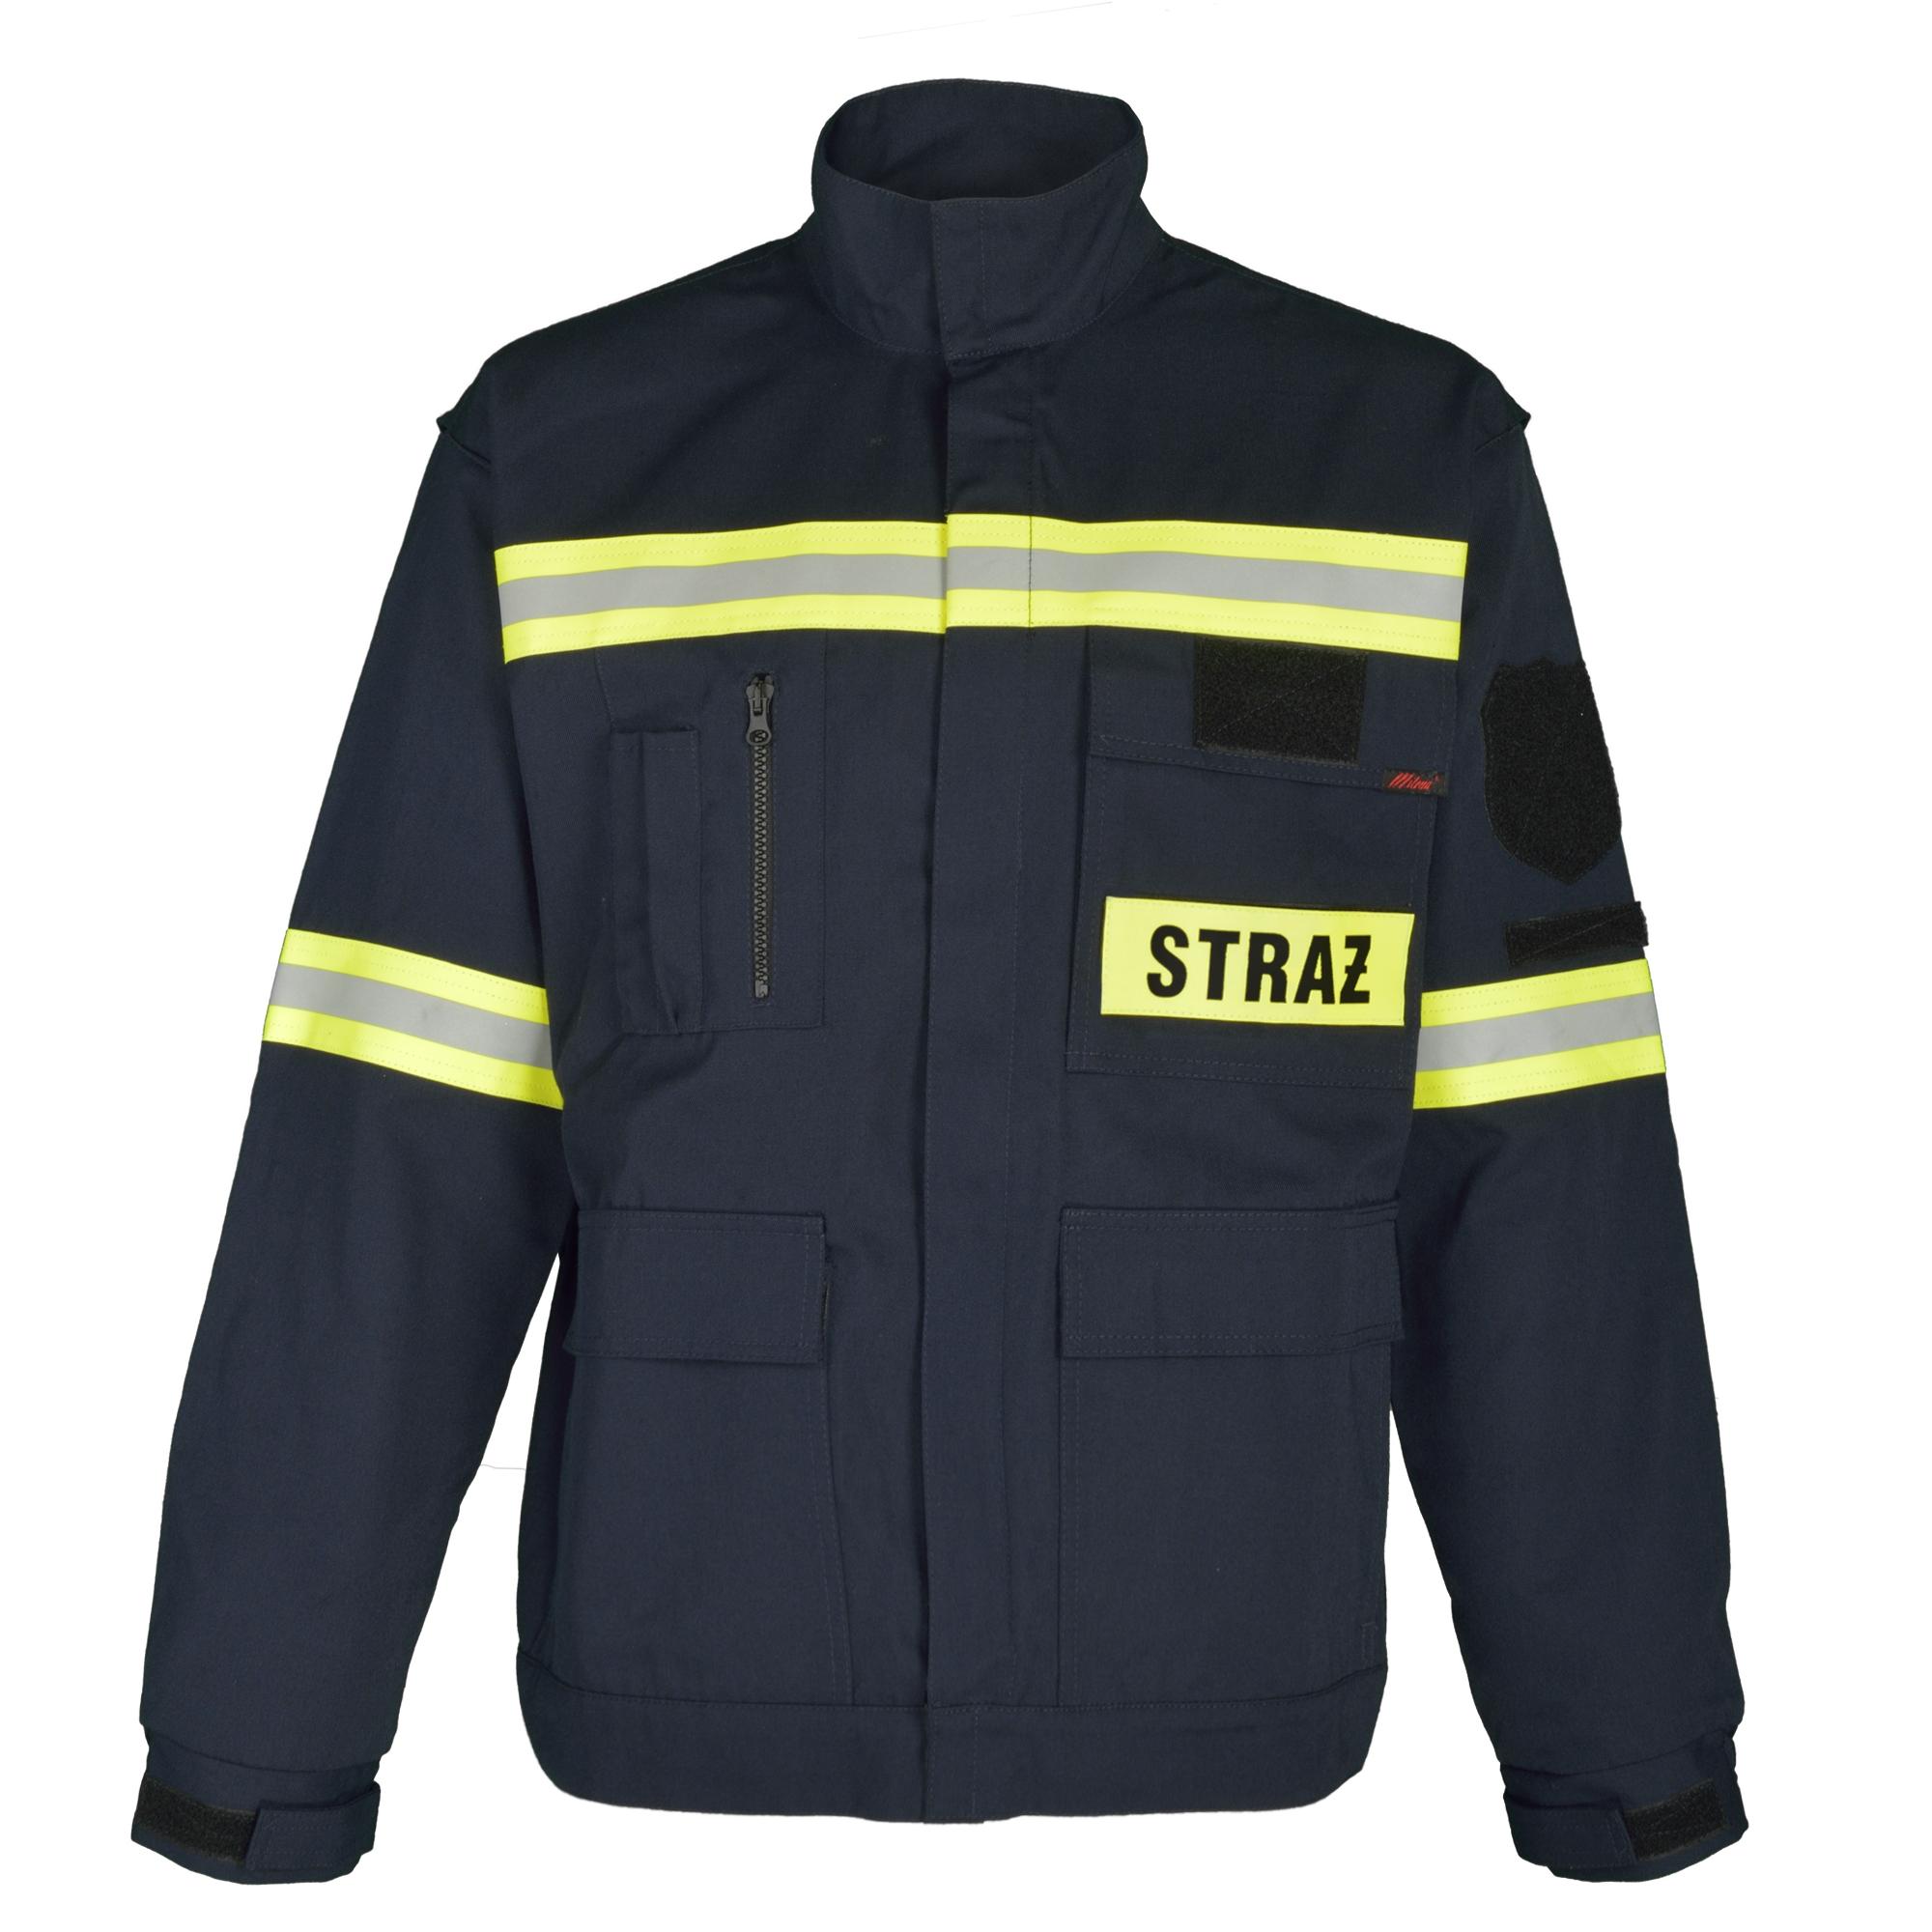 Station uniform of firefighter